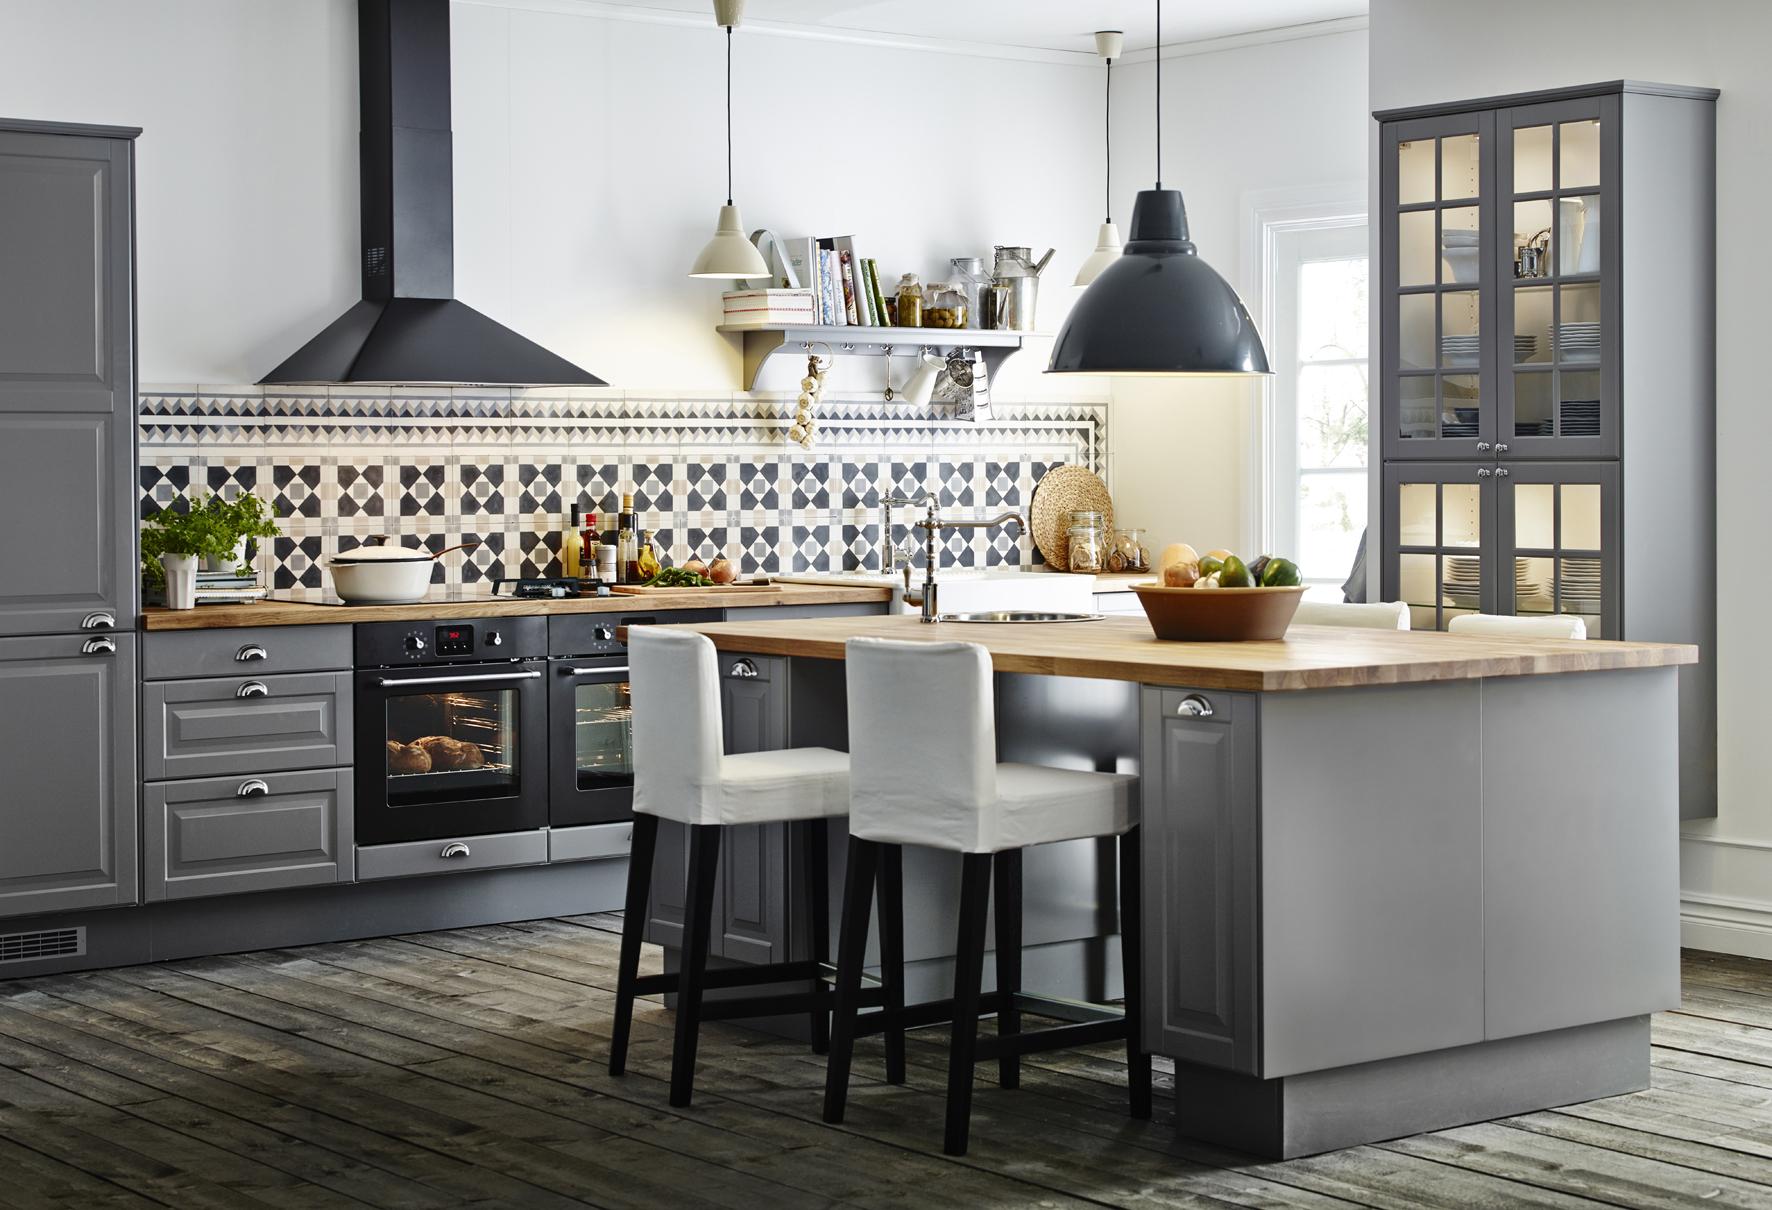 Mooie korting op ikea keukens faktum nieuws startpagina voor keuken idee n - Cuisine laxarby ikea ...